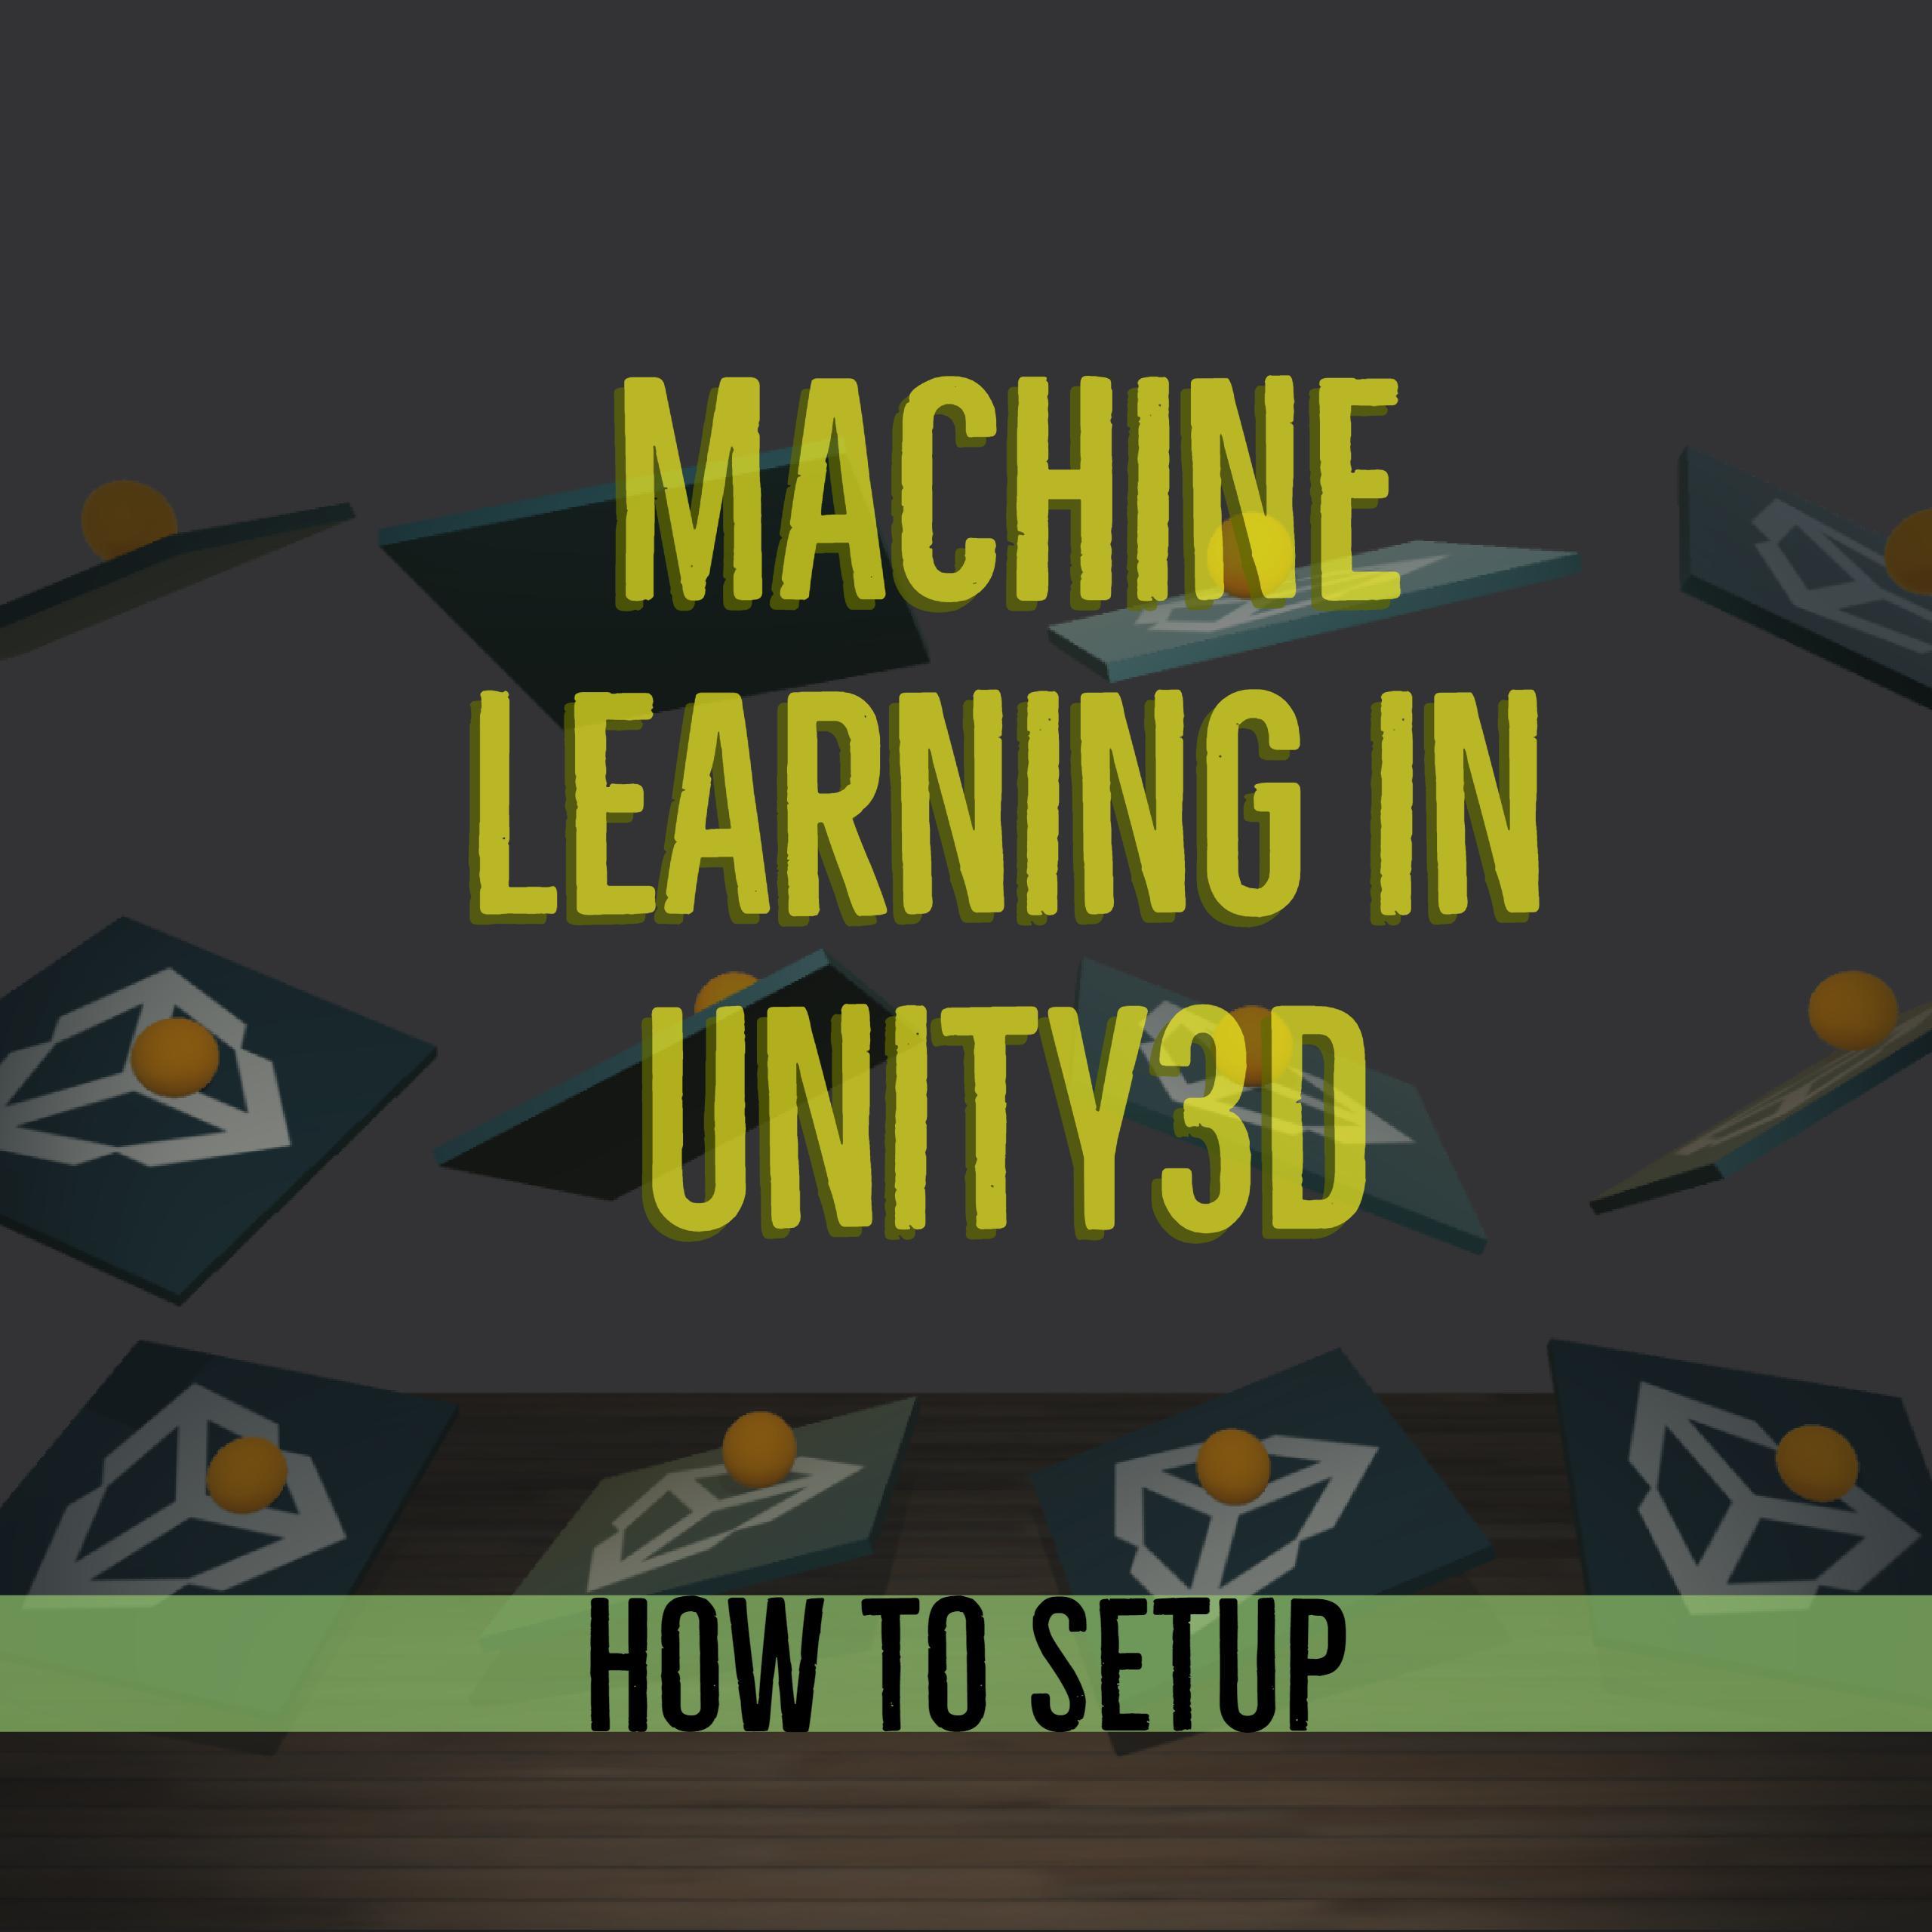 Unity机器学习环境搭建 - Mac 篇